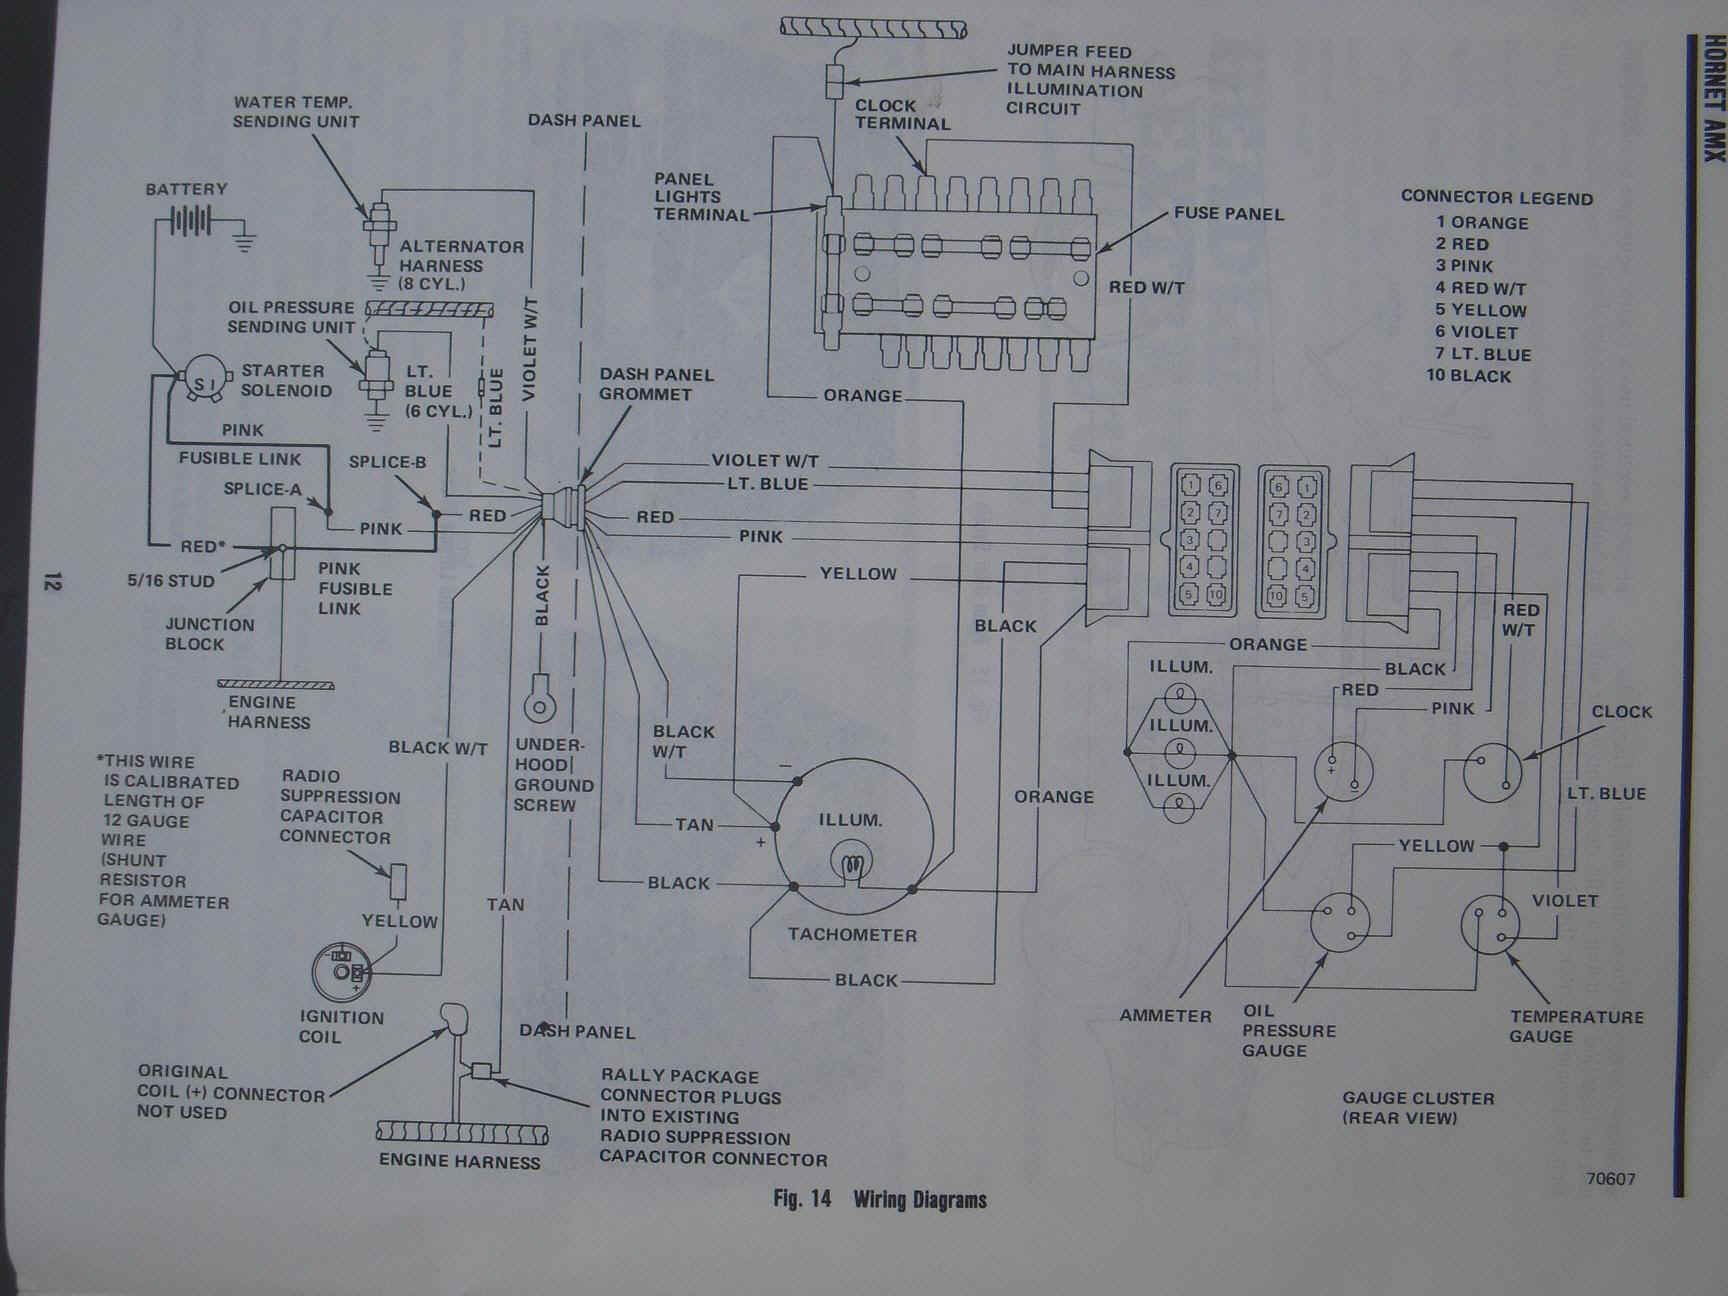 amx wiring diagram wiring diagrams the  1970 amc amx wiring diagram wiring diagram data schema 1970 amc amx wiring diagram wiring diagram